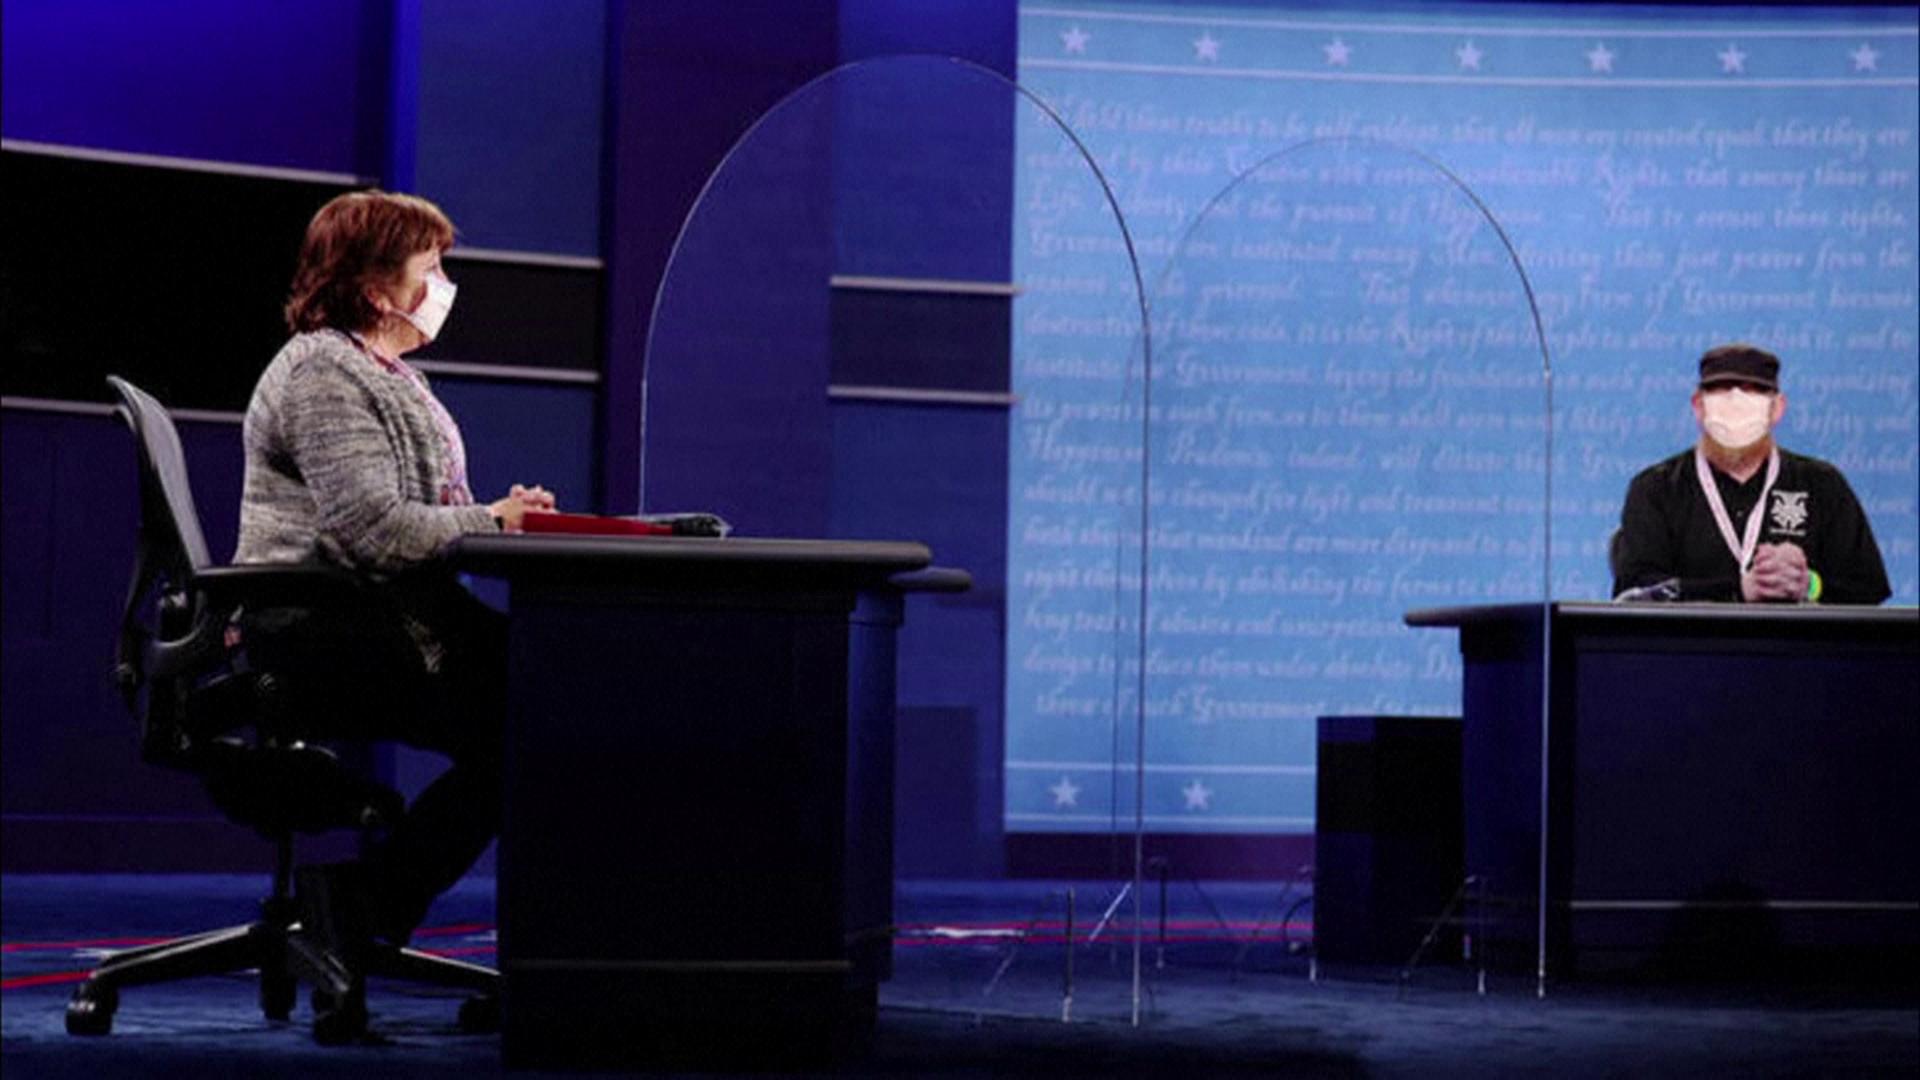 Barreira de acrílico instalada para debate entre candidatos a vice nos EUA